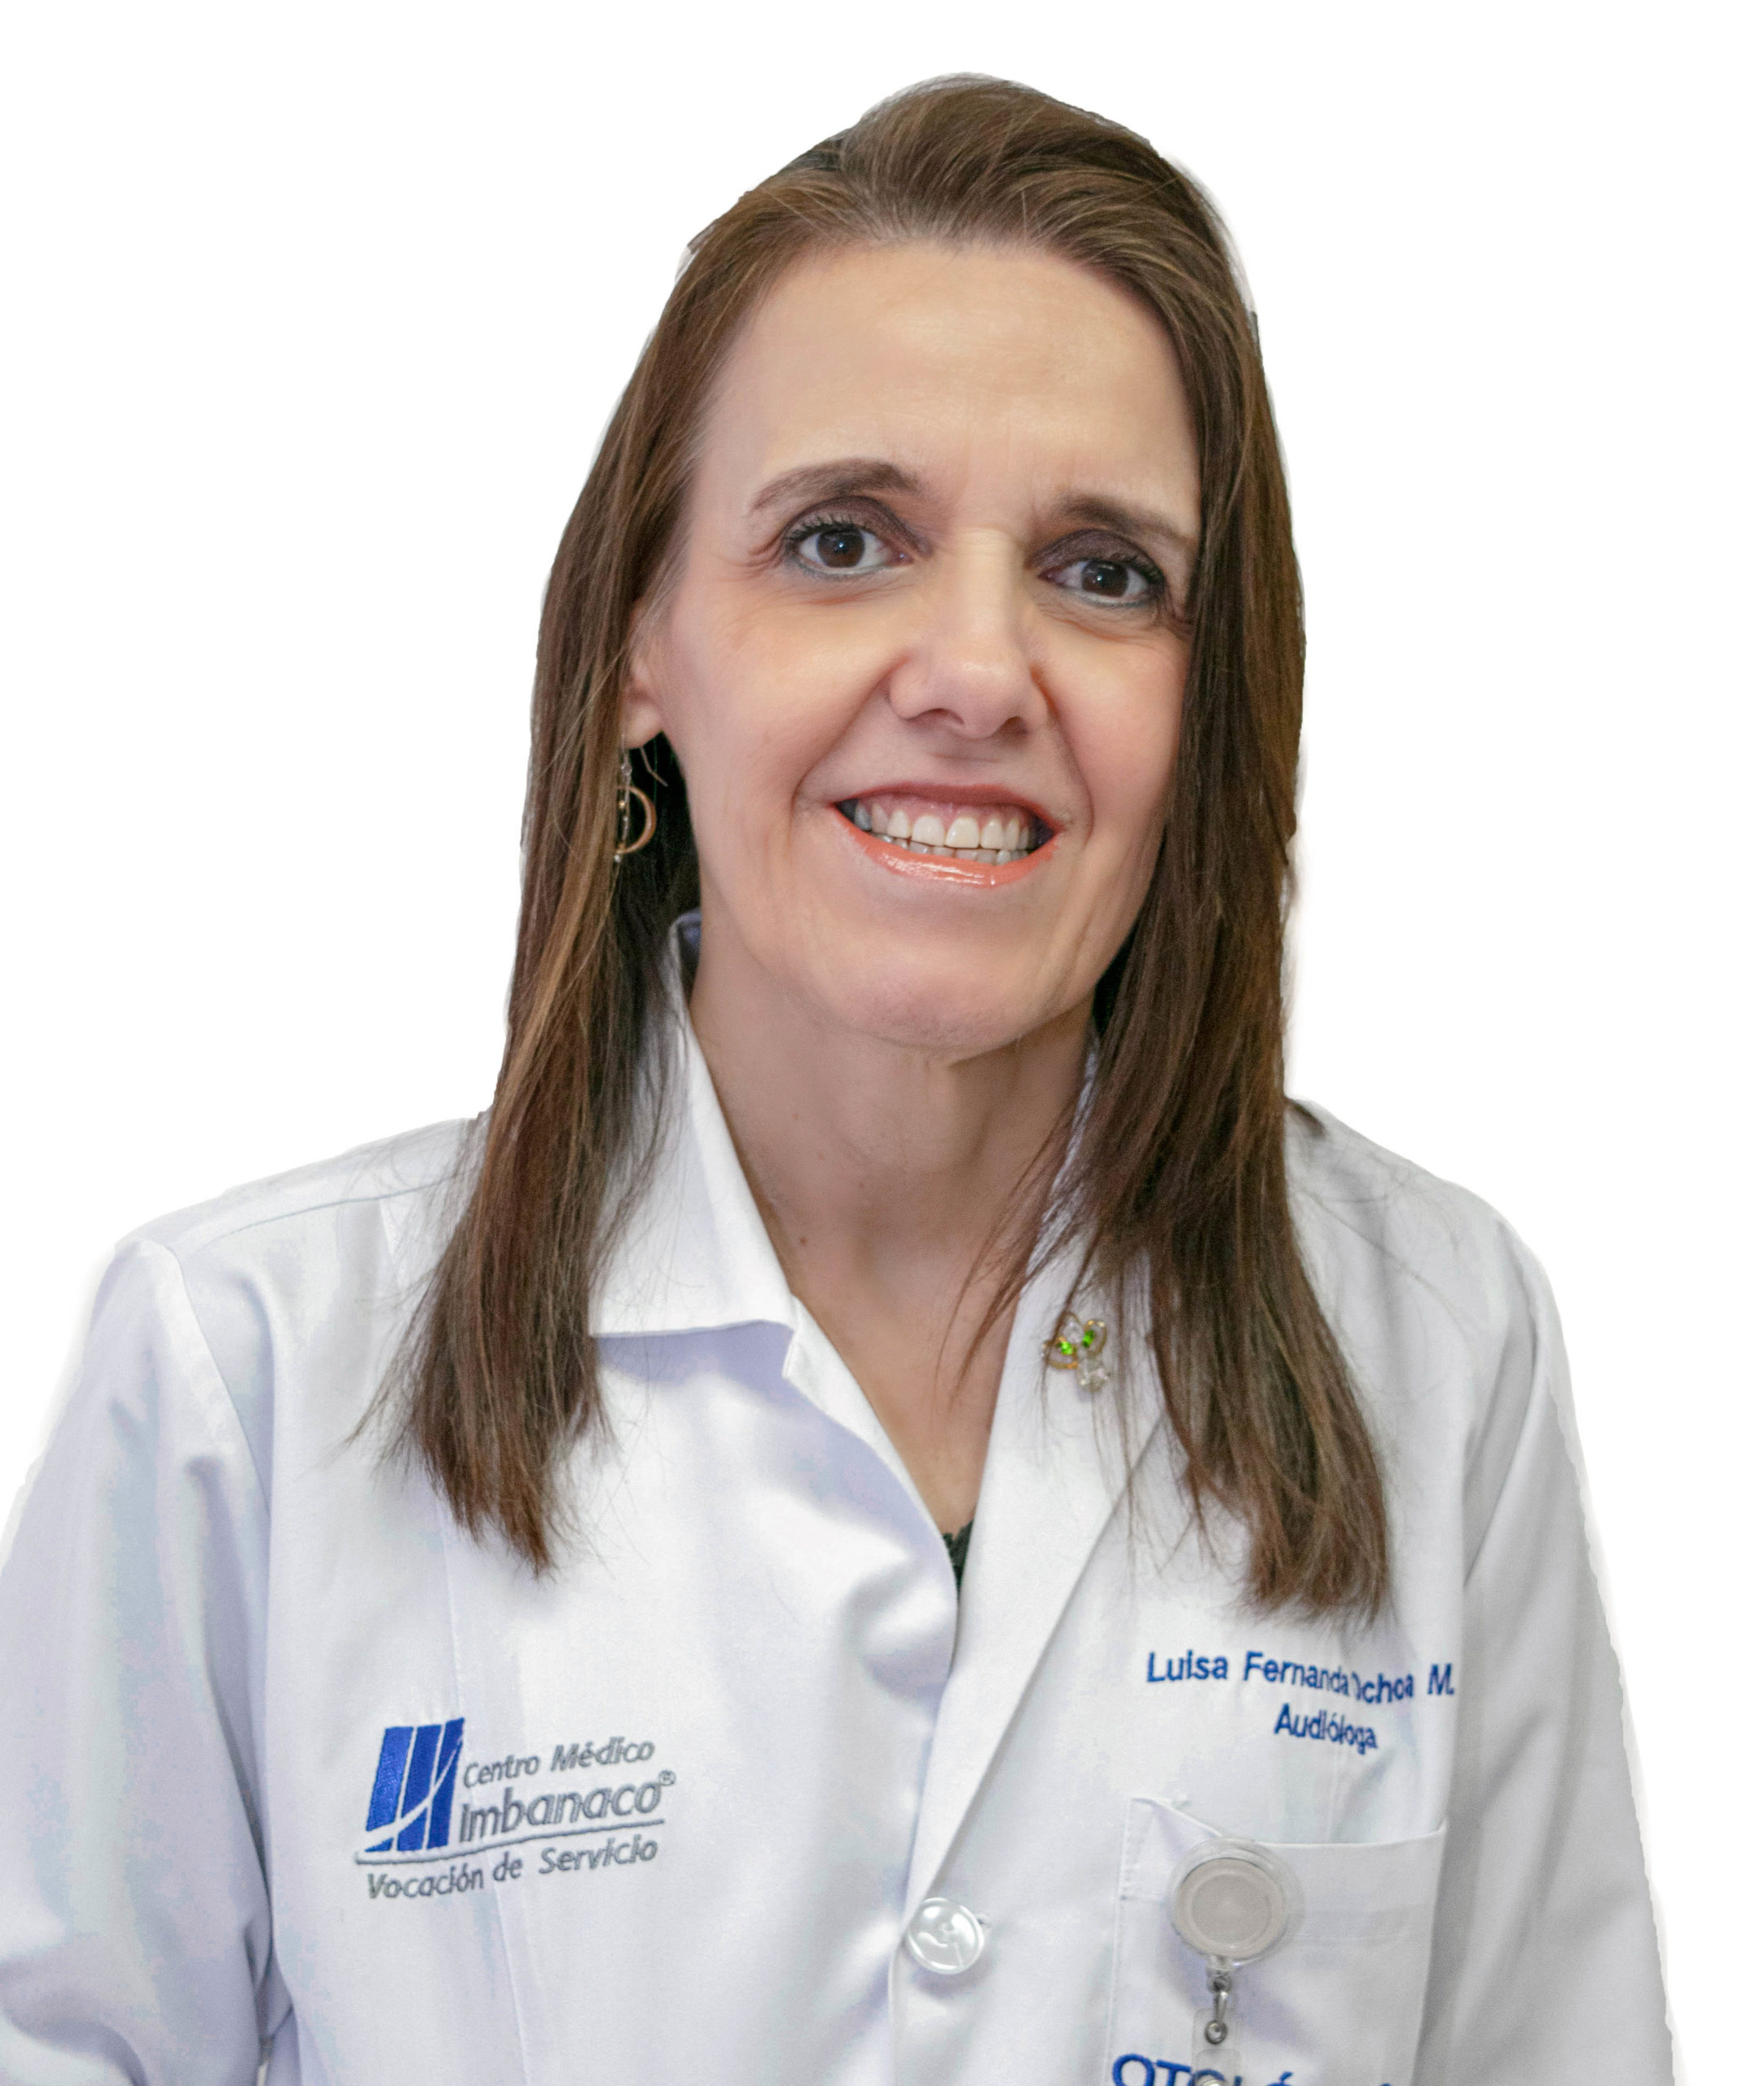 Audiologa Otologico Luisa Fernanda Ochoa Martinez